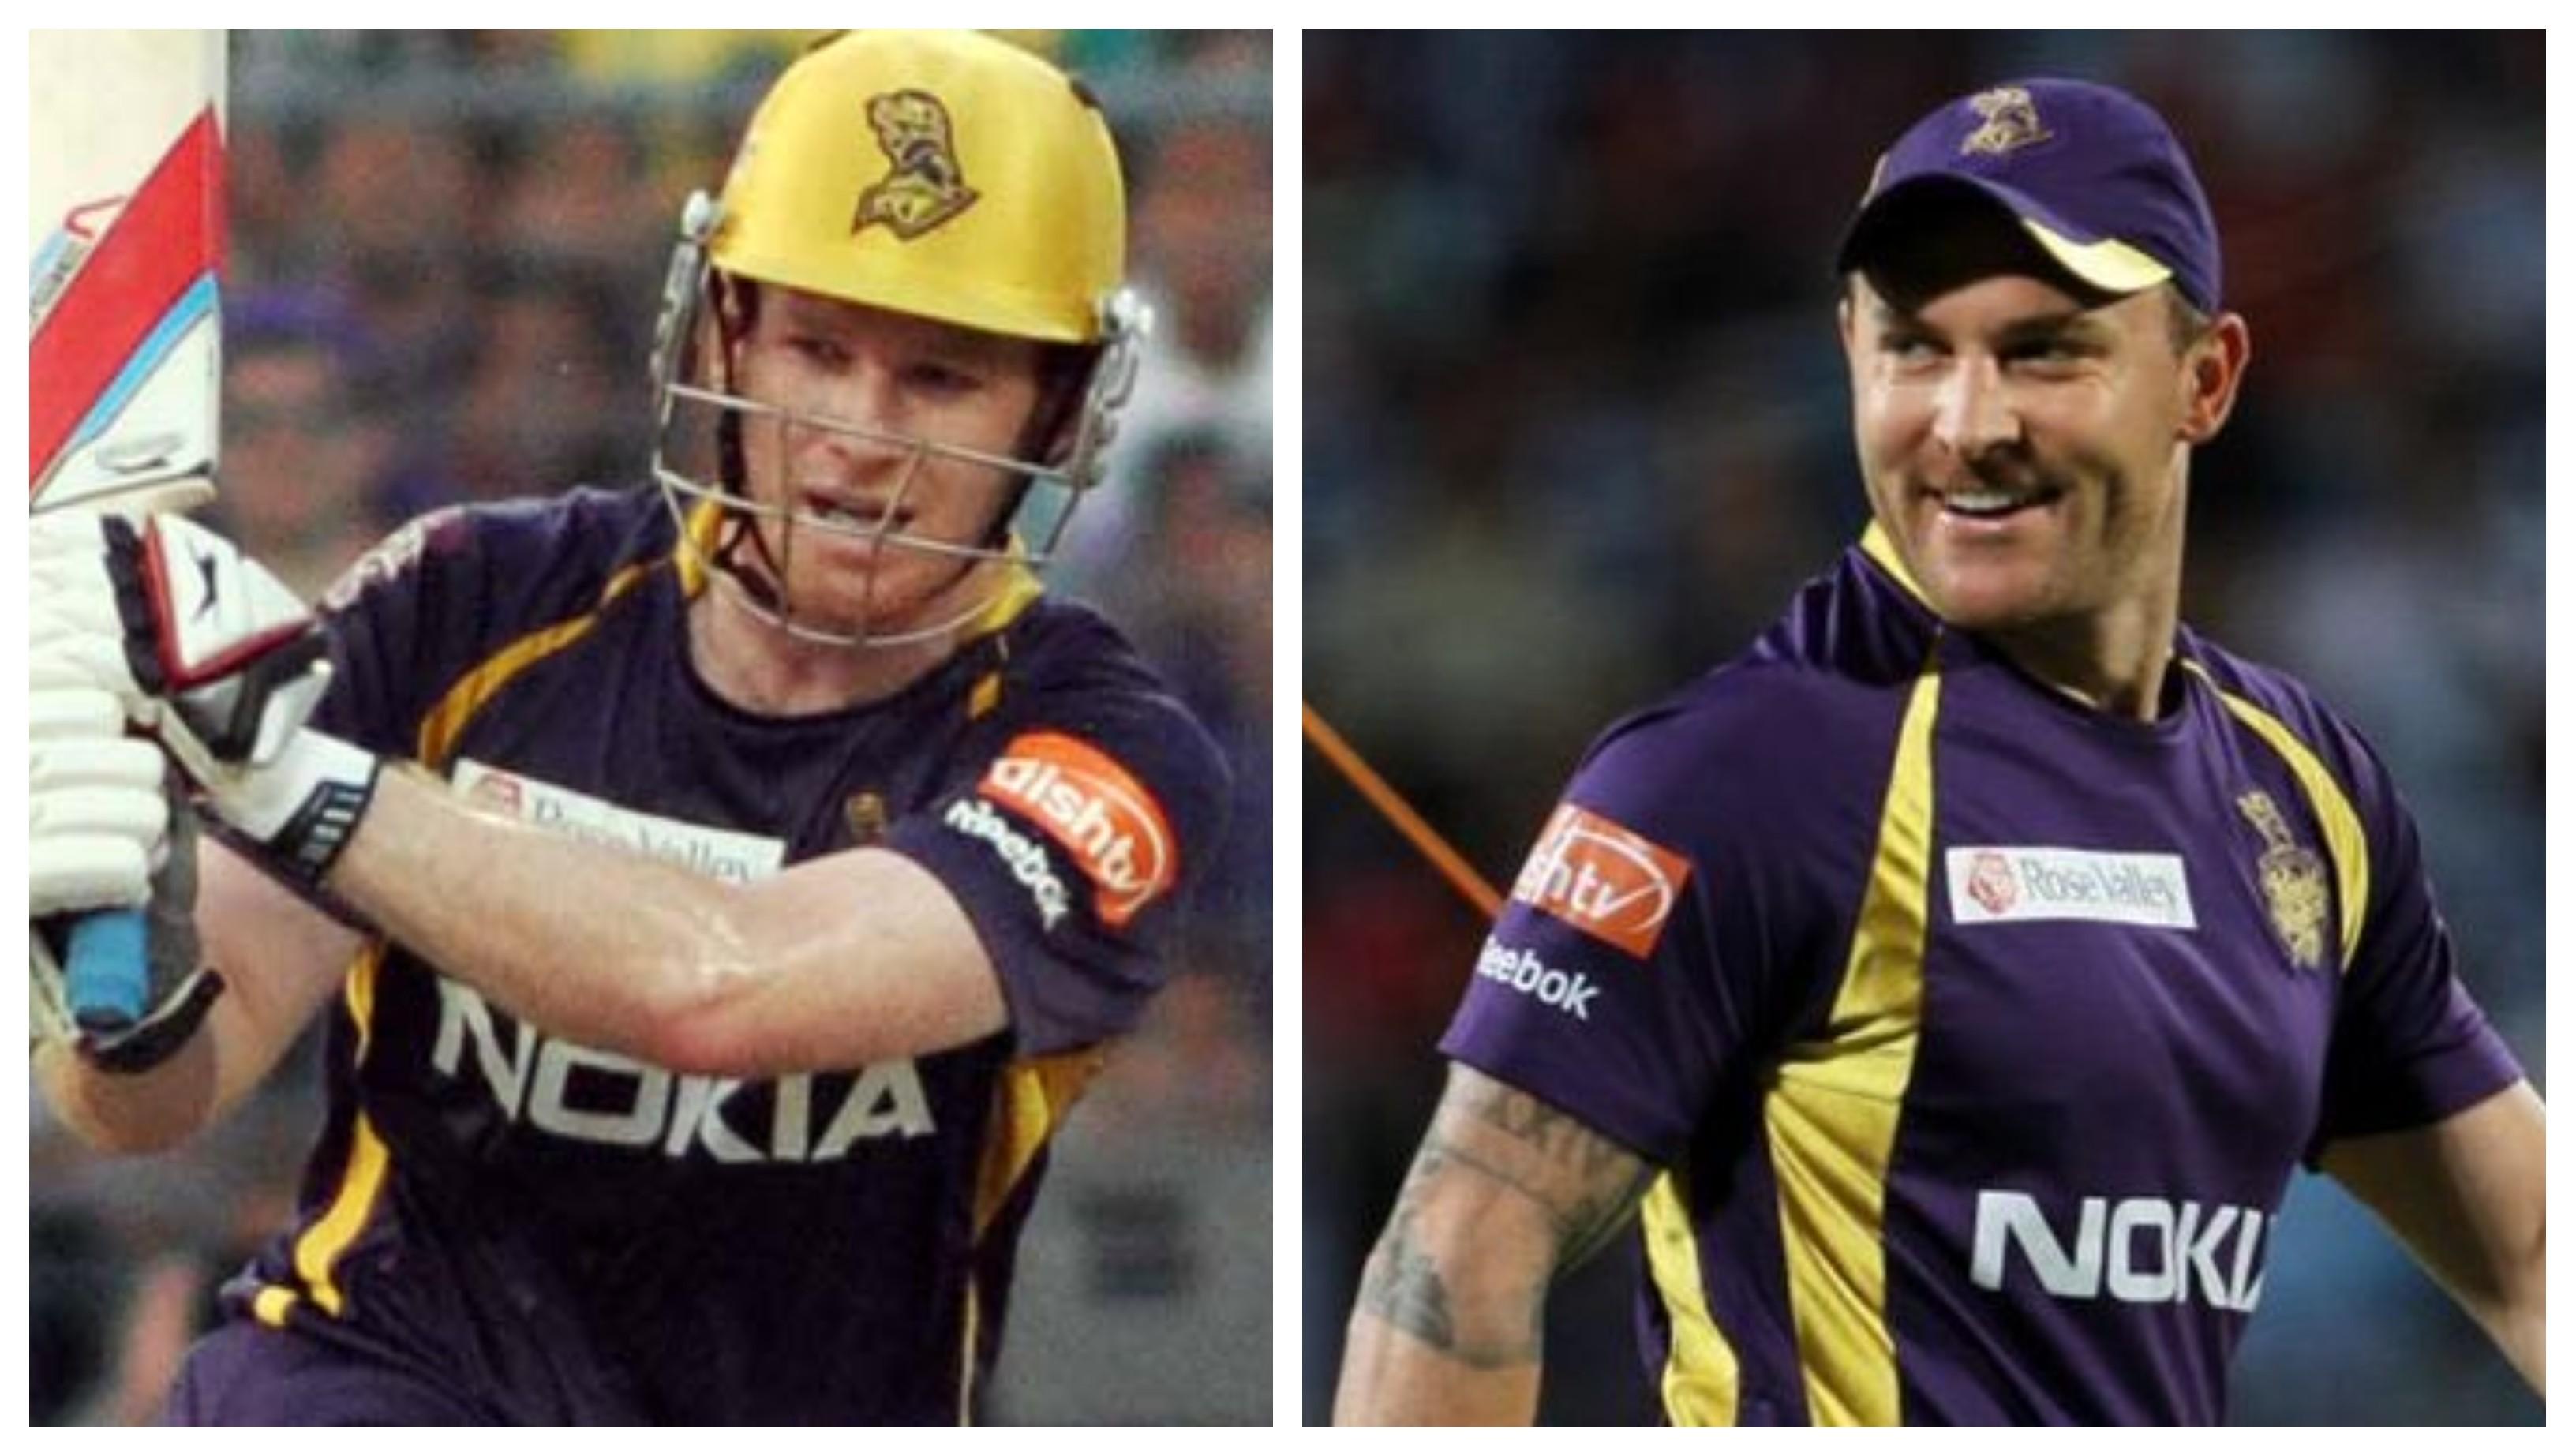 IPL 2020: McCullum happy to have Morgan bolster KKR's batting line-up